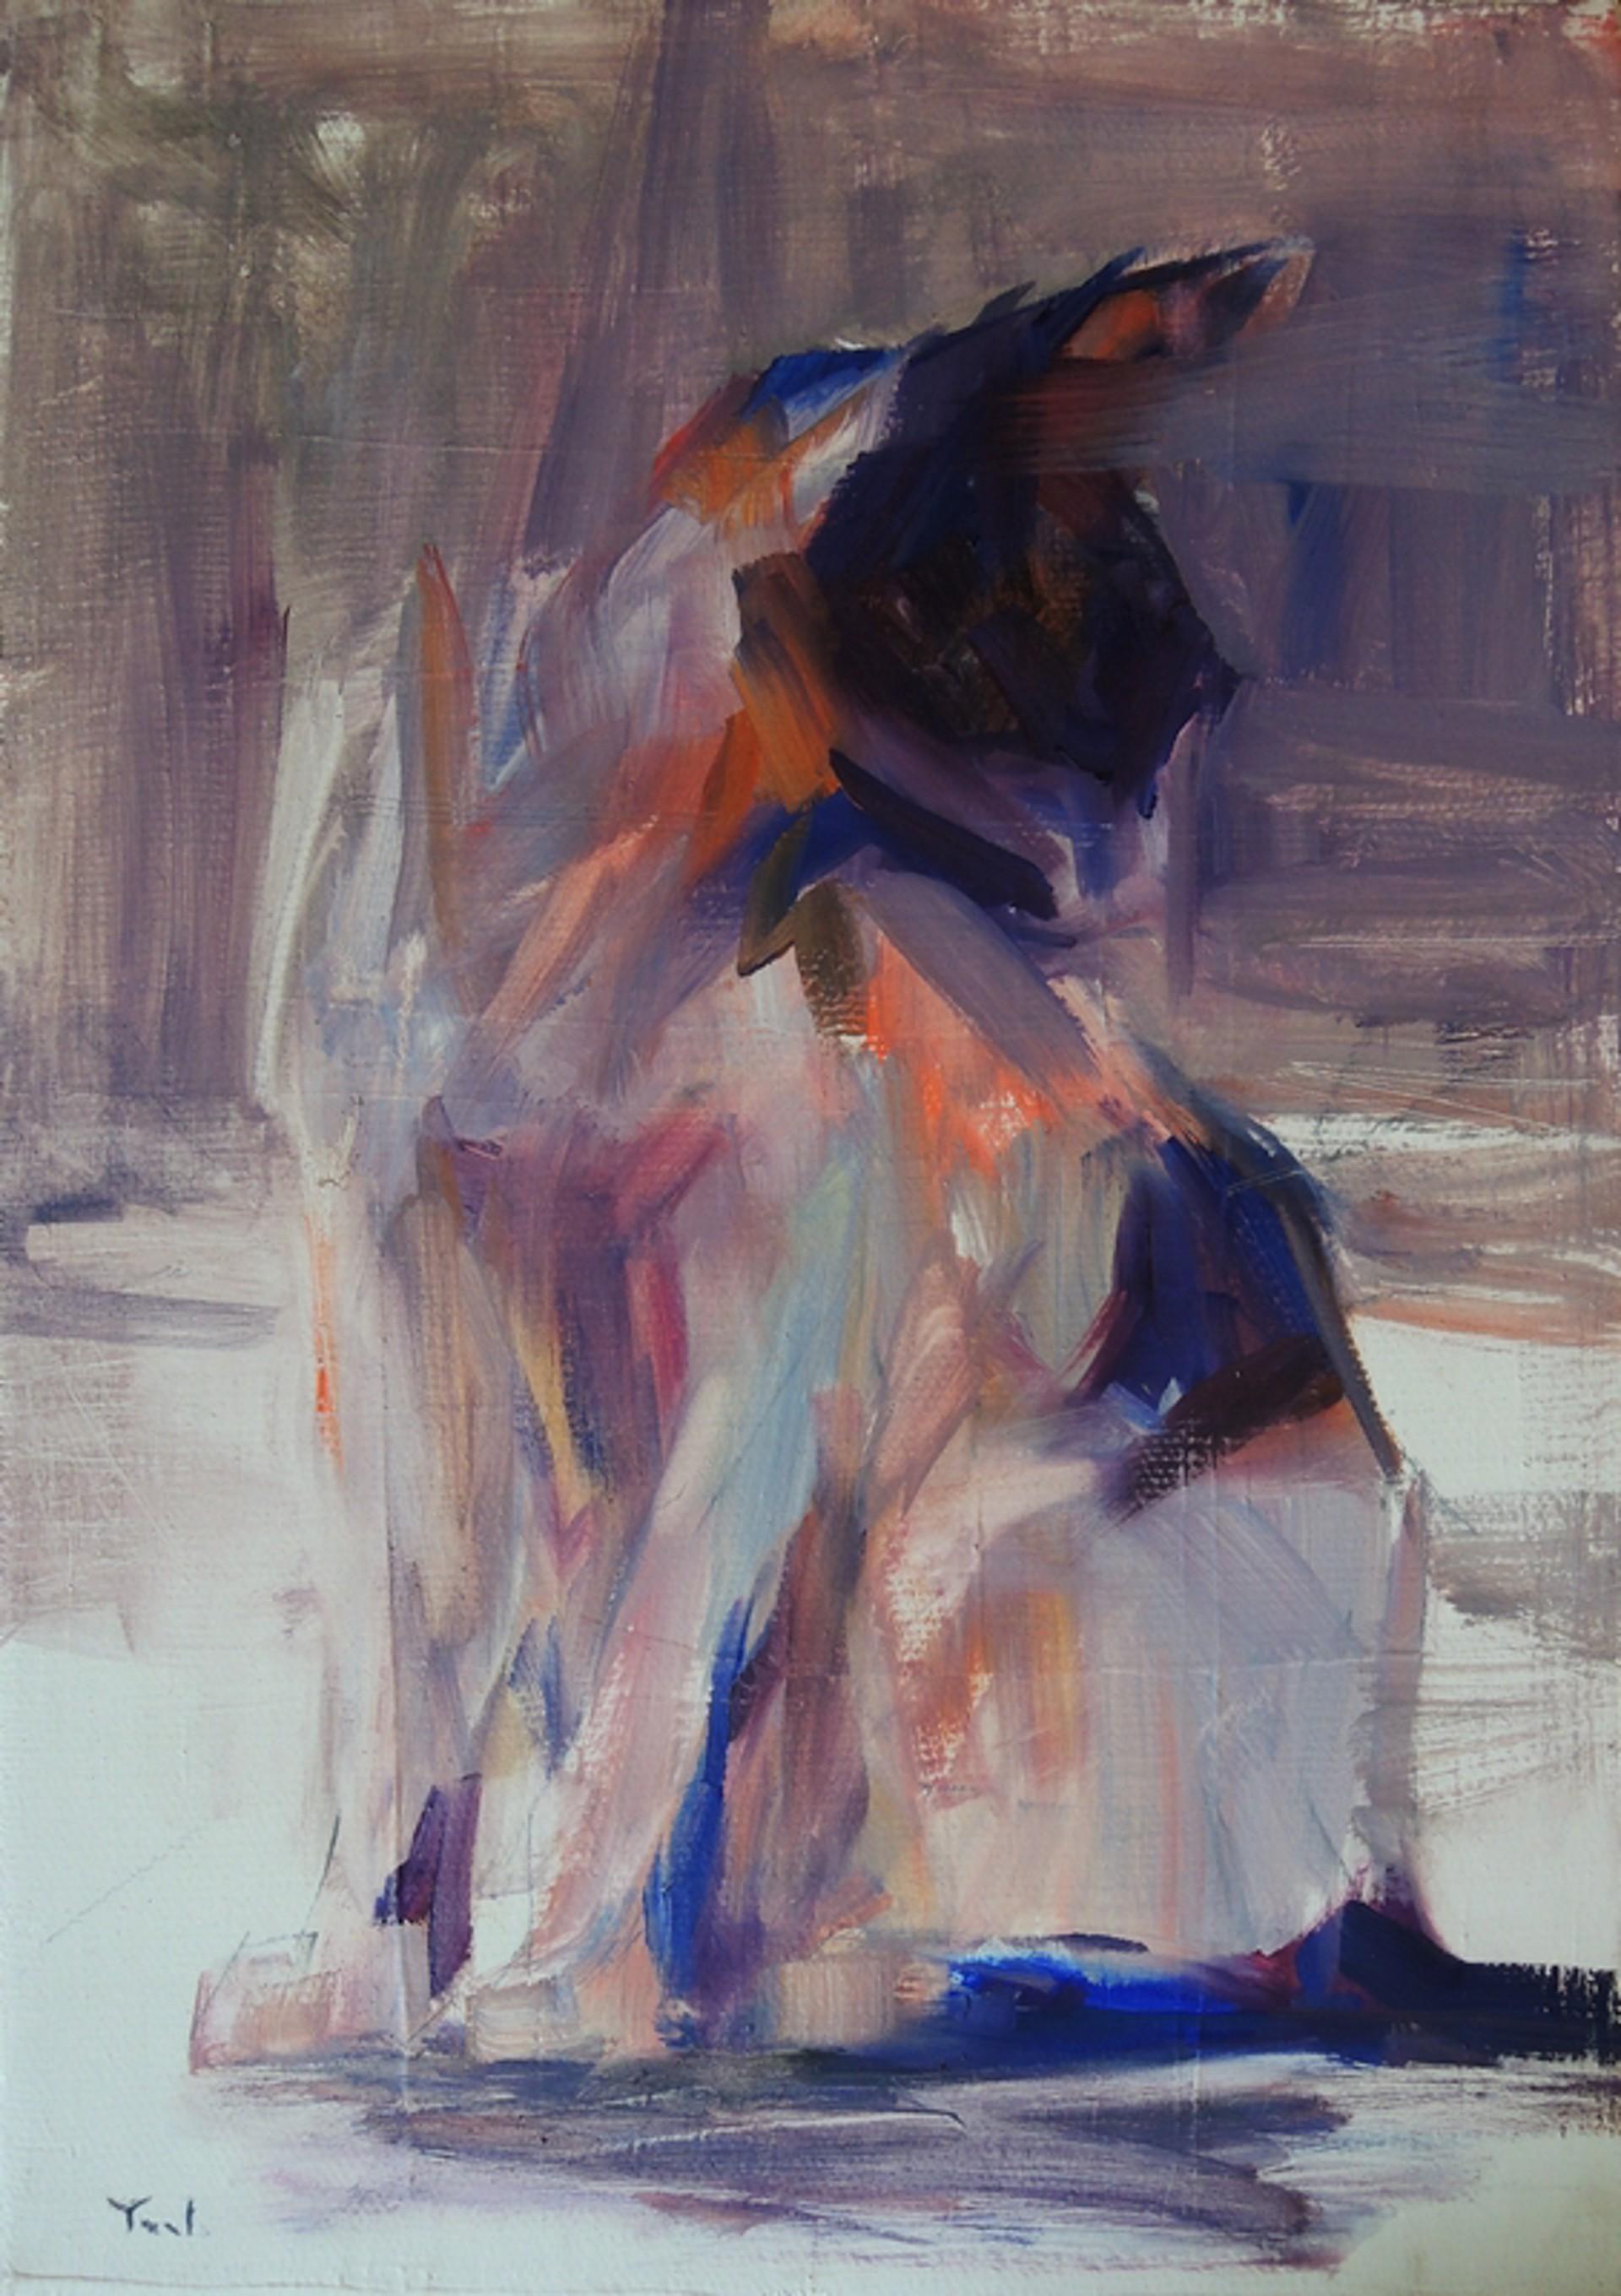 Demure by Yael Maimon